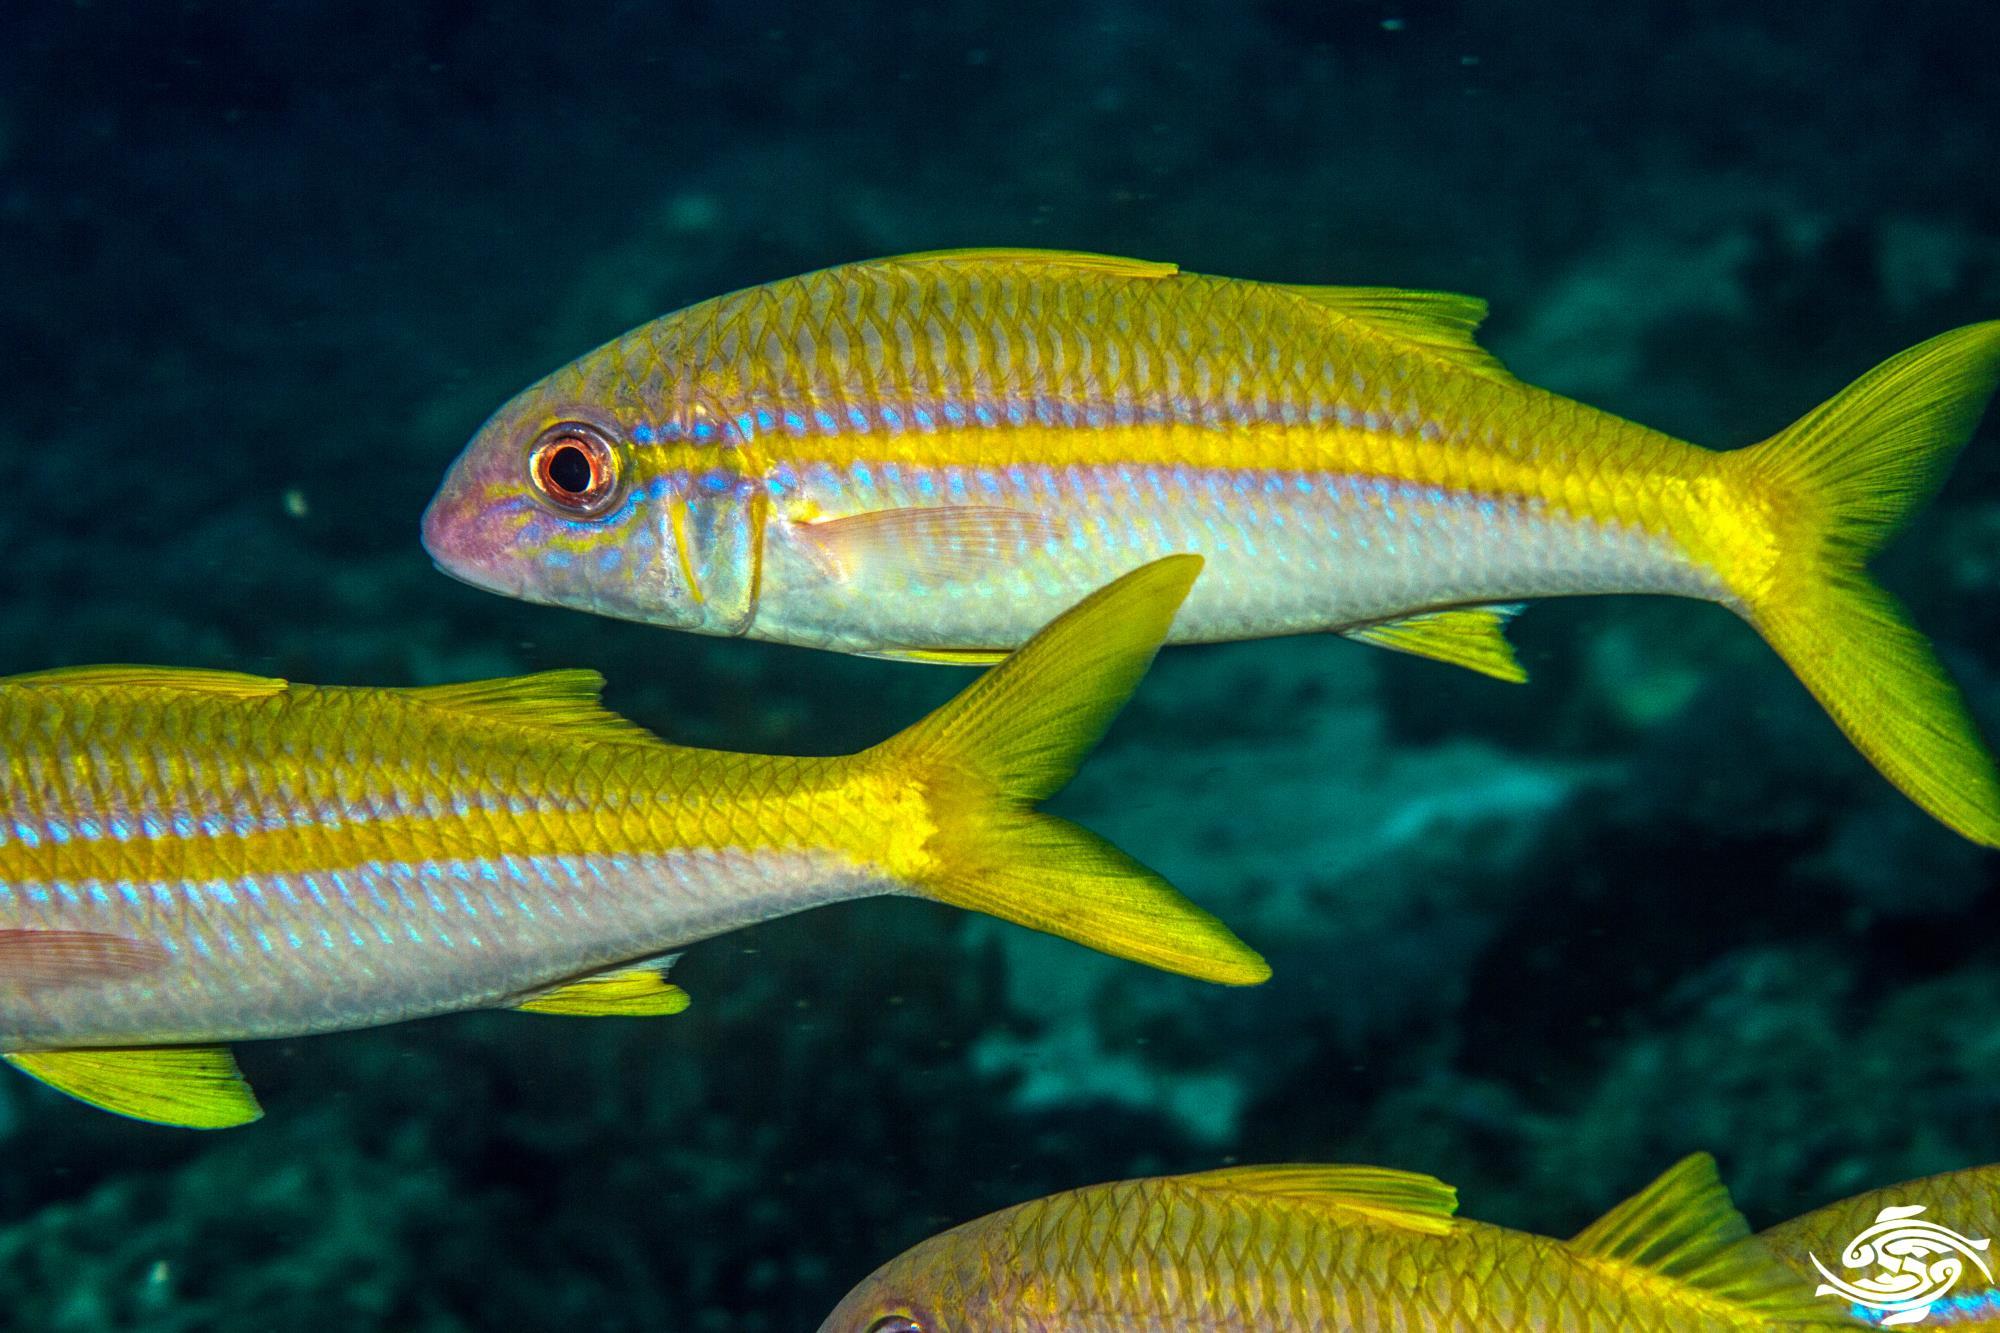 Yellowfin goatfish (Mulloidychtys vanicolensis)